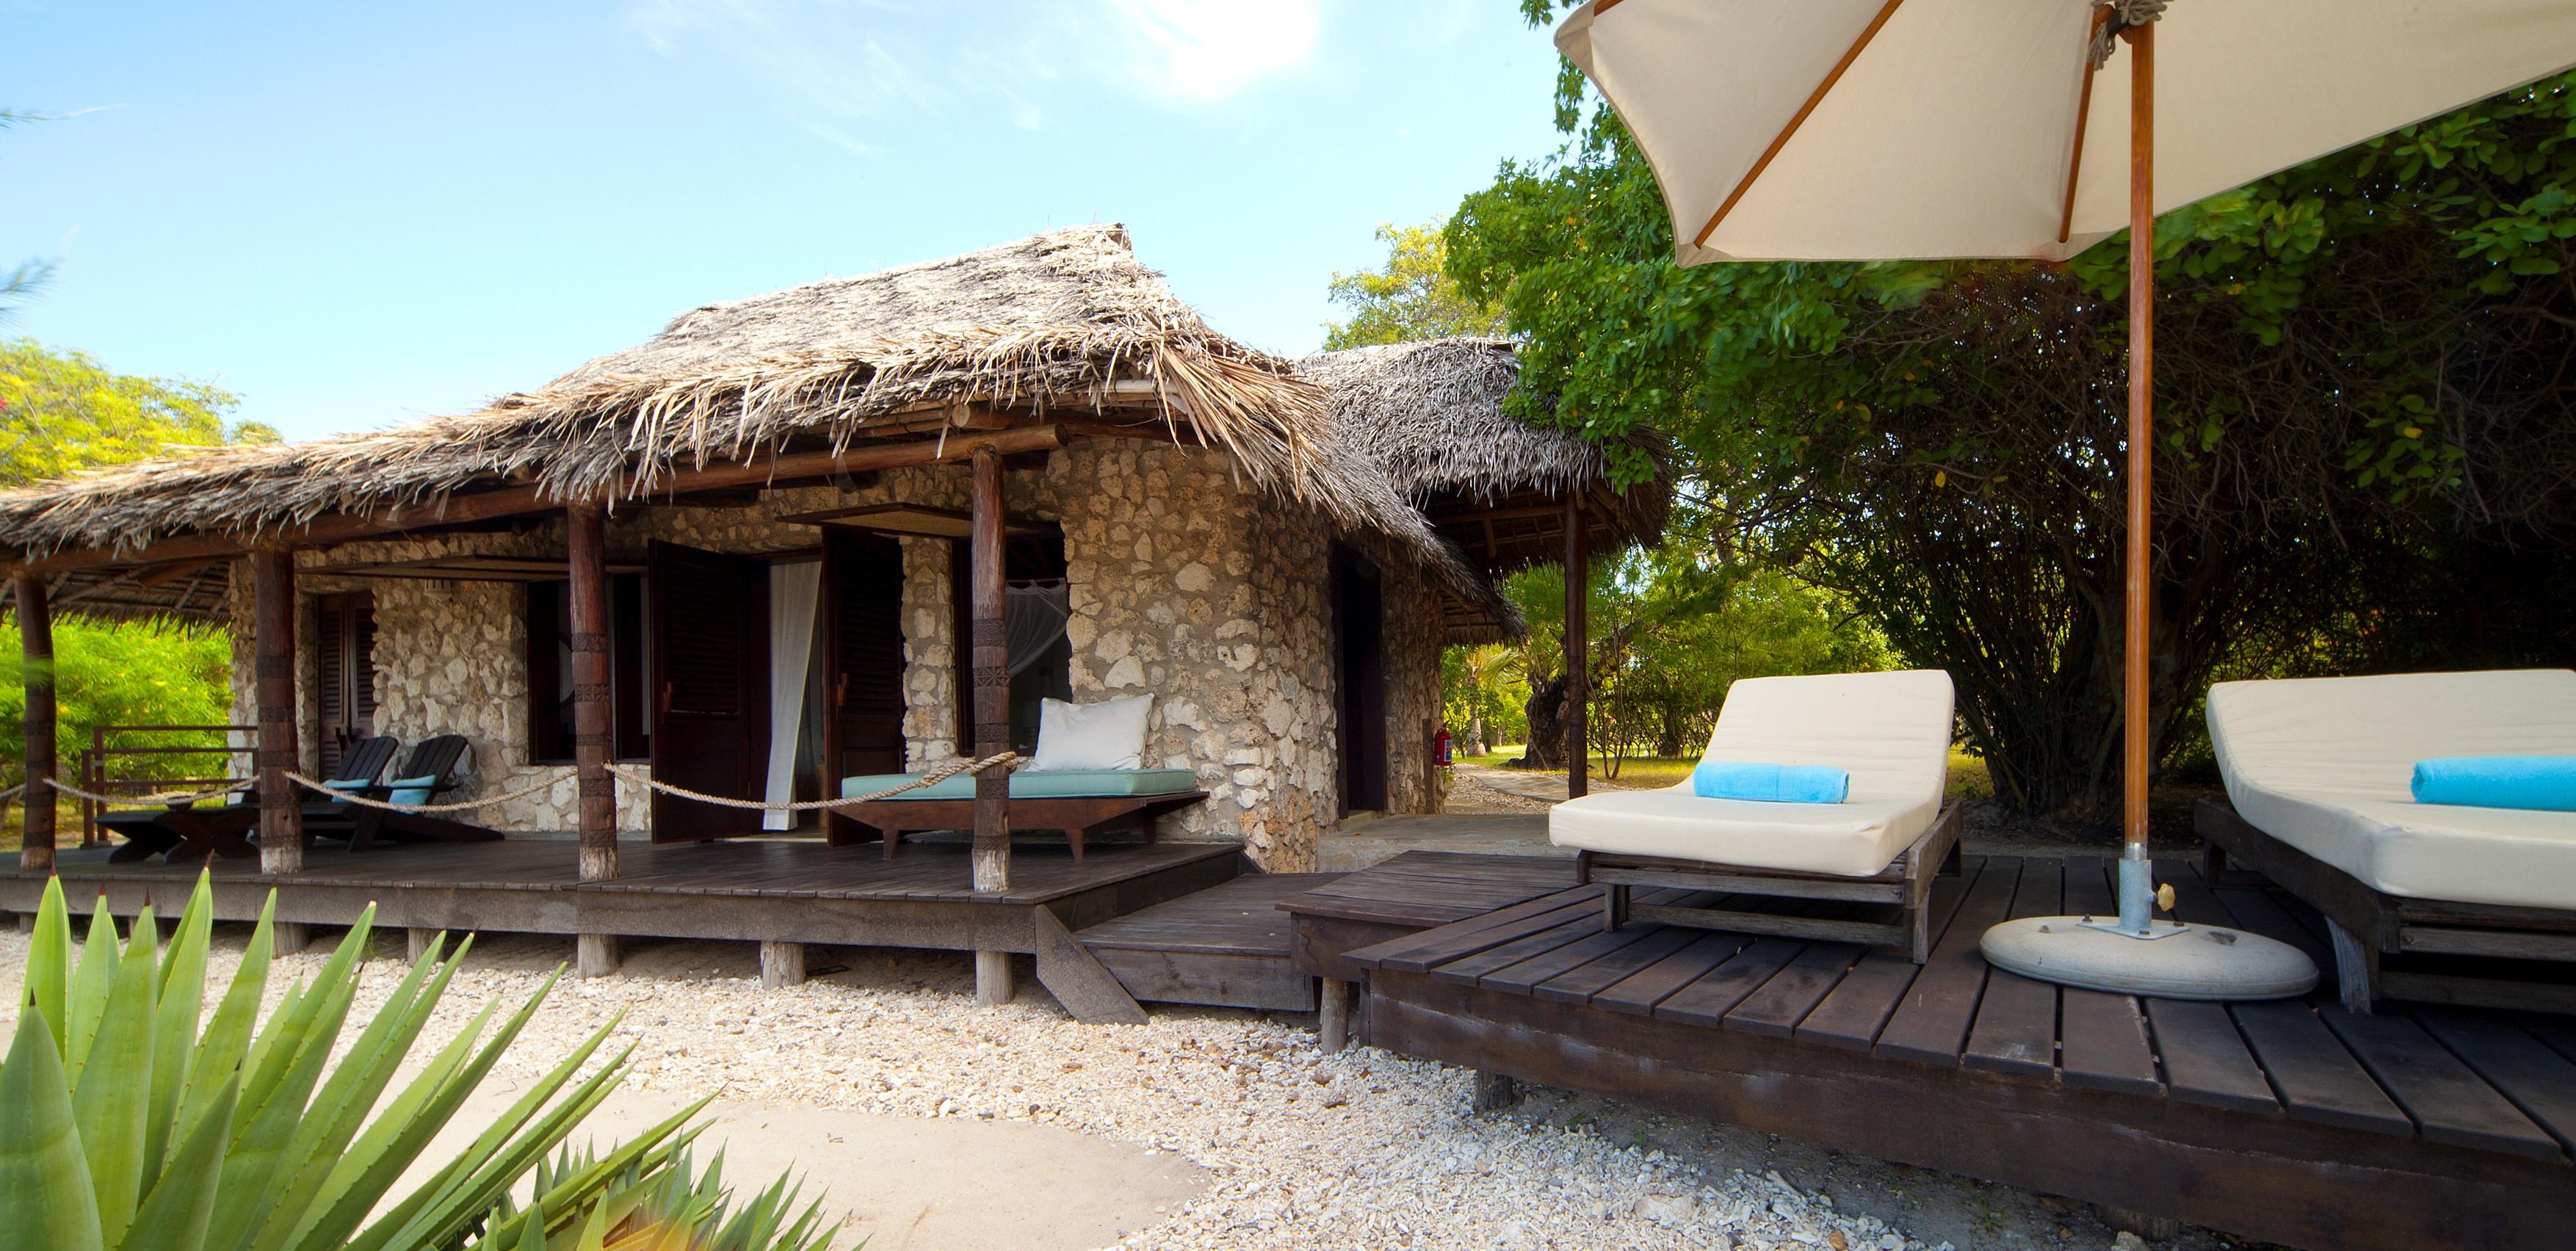 azura_quilalea_kaskazi_villa_exterior